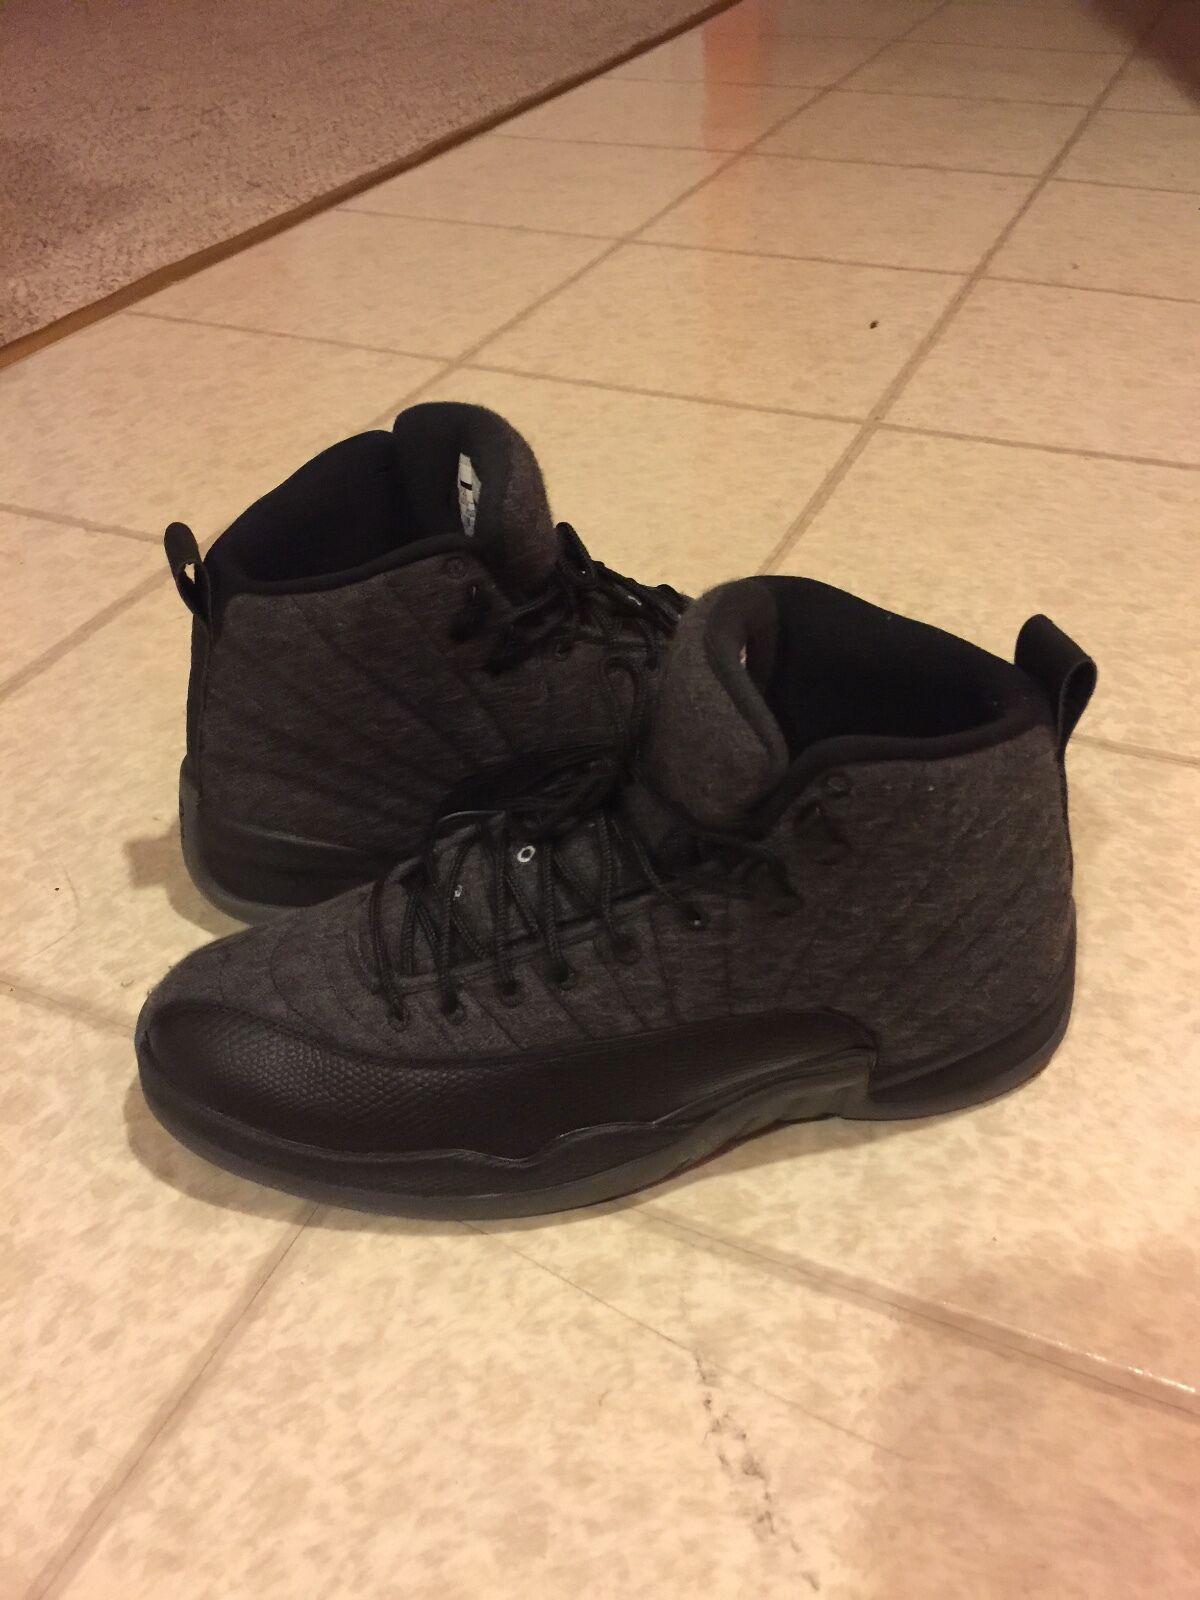 Mens Air Jordan Retro 12 Wool Dark Grey Metallic Silver 852627-003 Nike Black Wild casual shoes